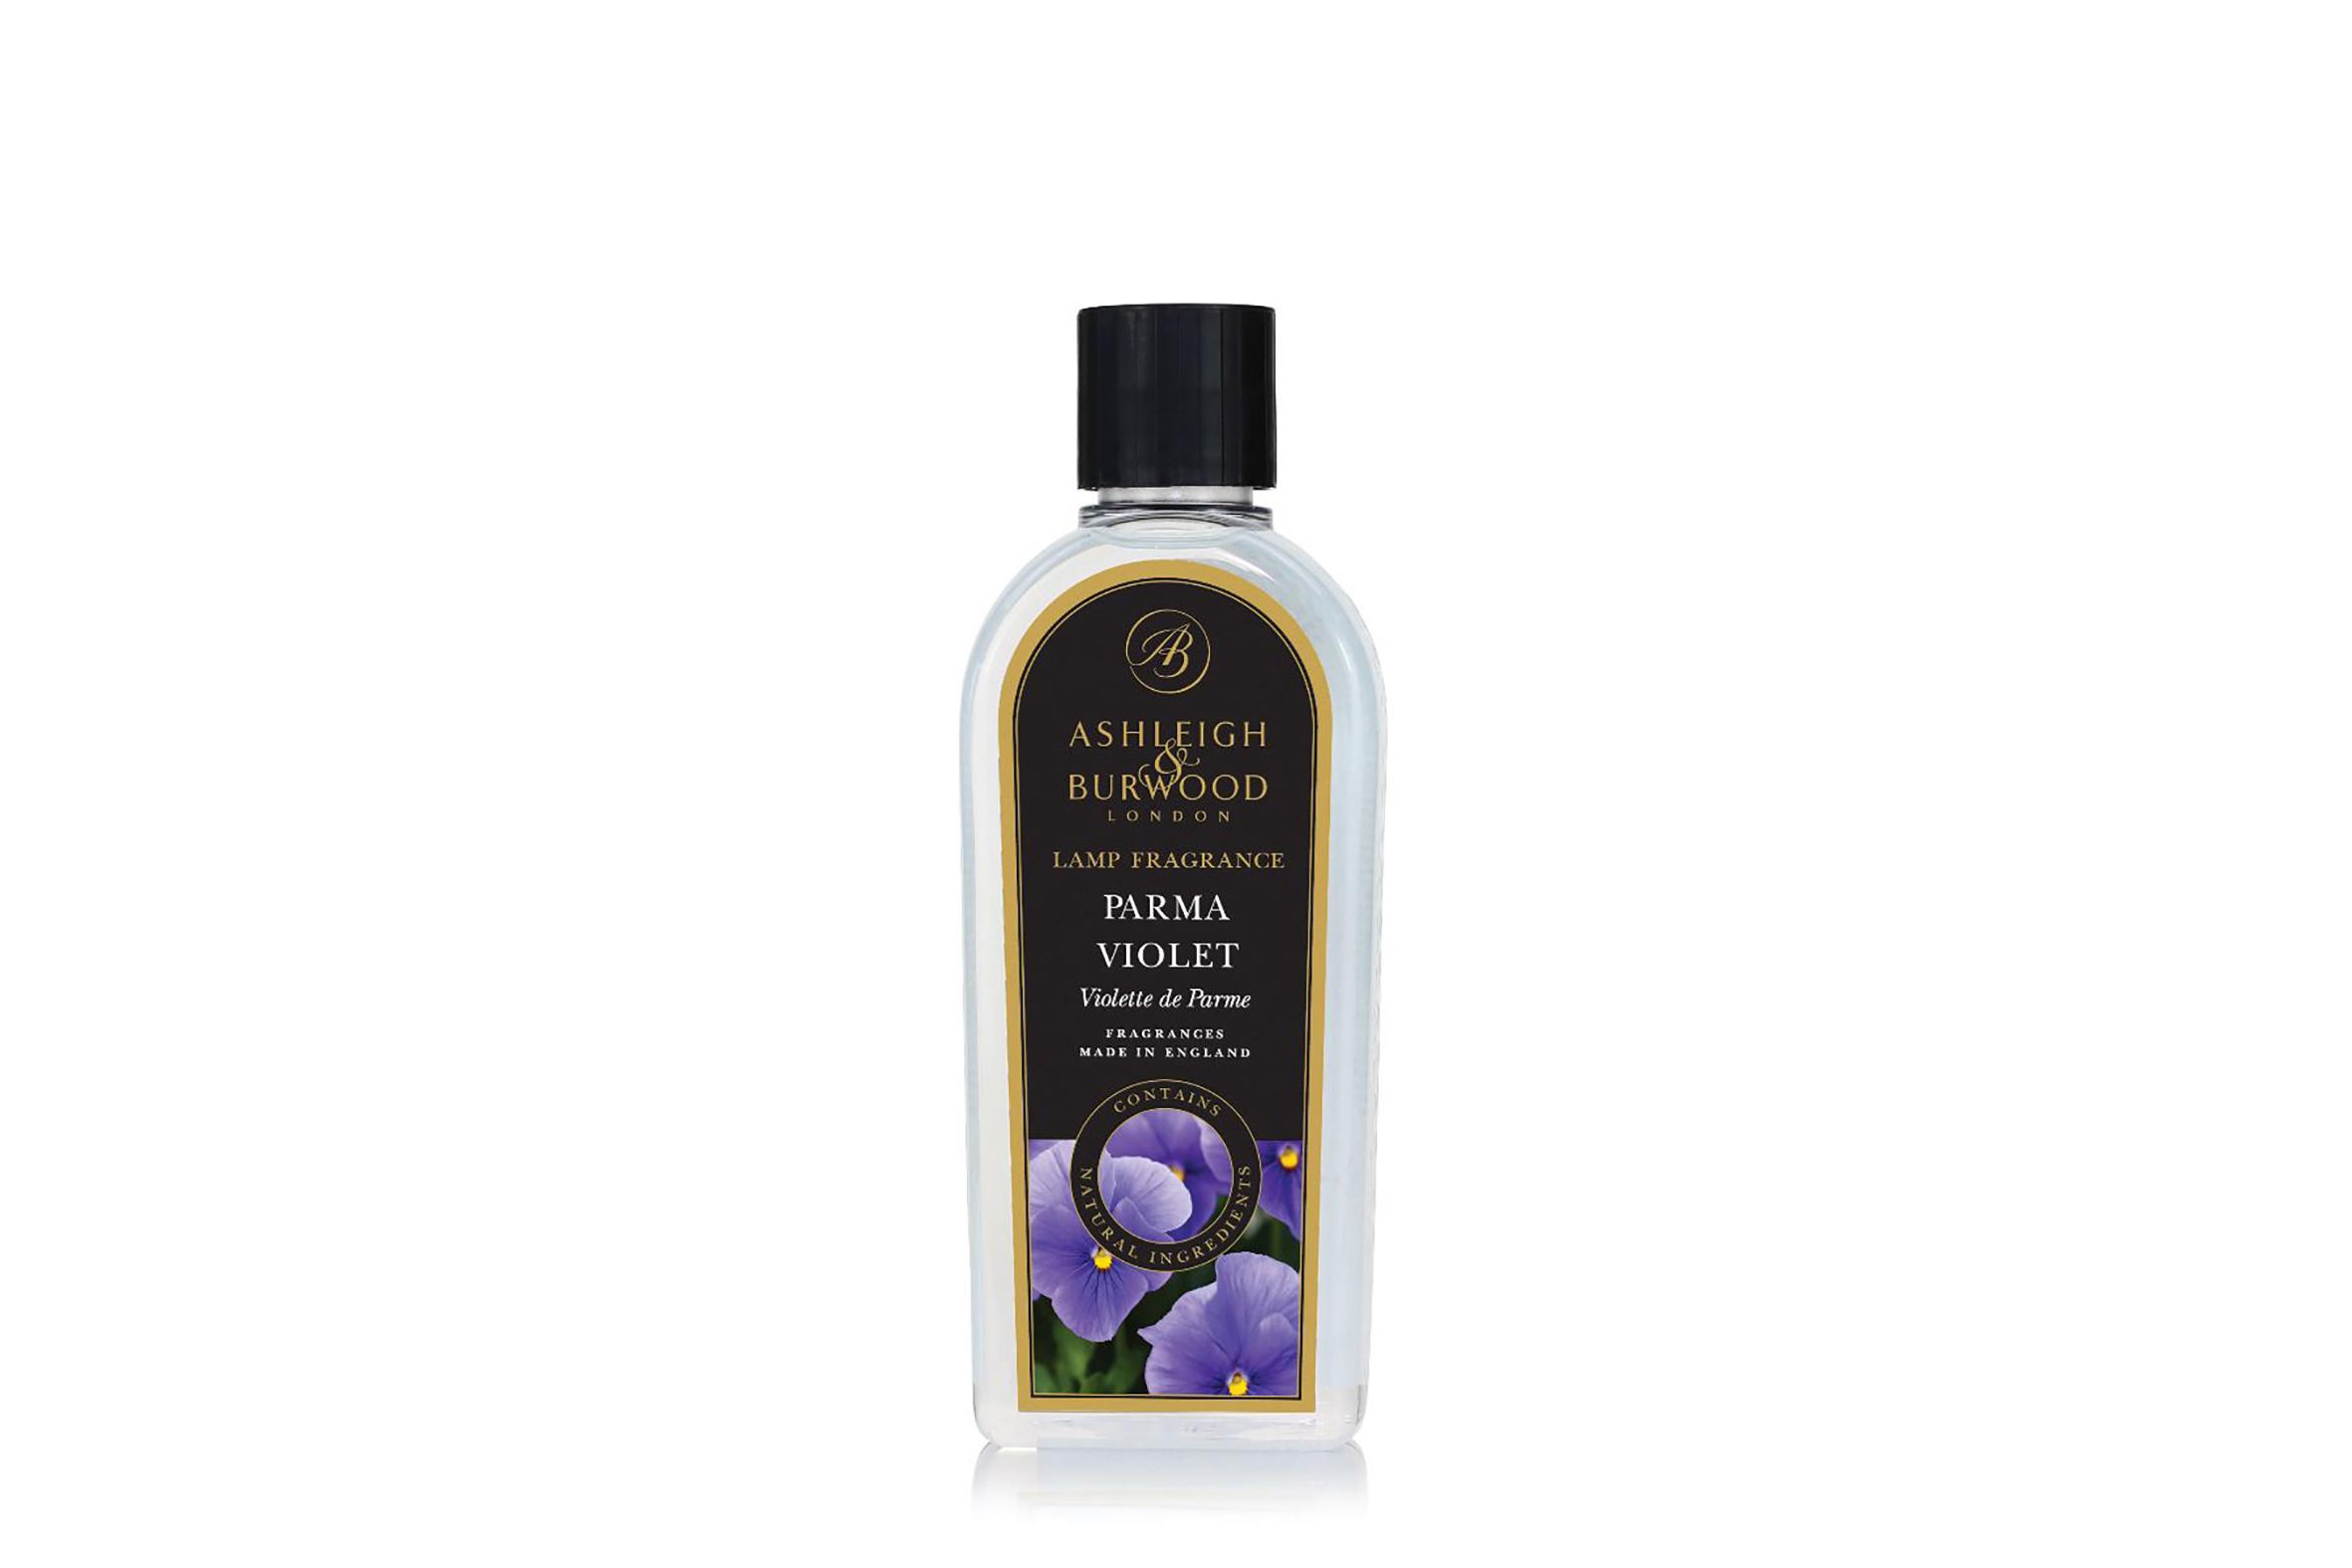 Geurlamp olie Parma Violet L